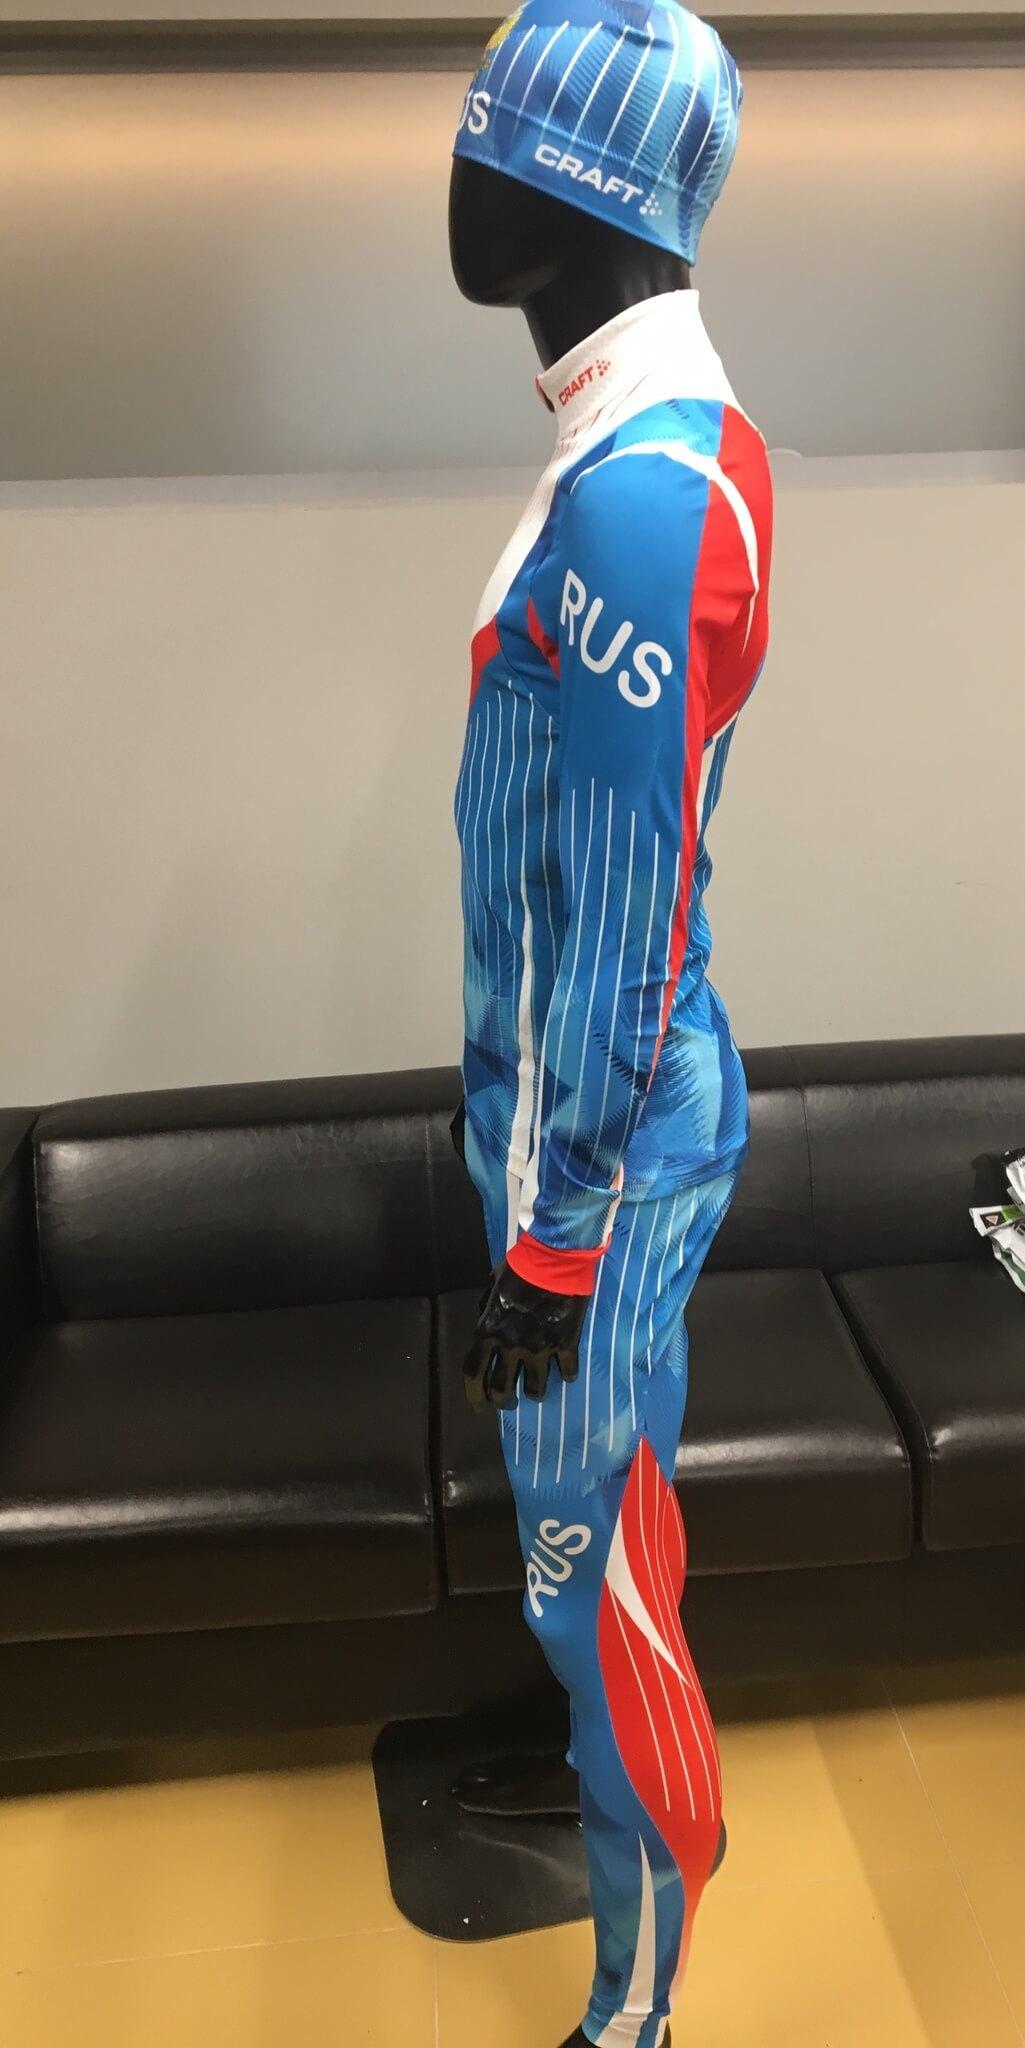 Элитный гоночный комбинезон Craft Ski Team Russia - 5